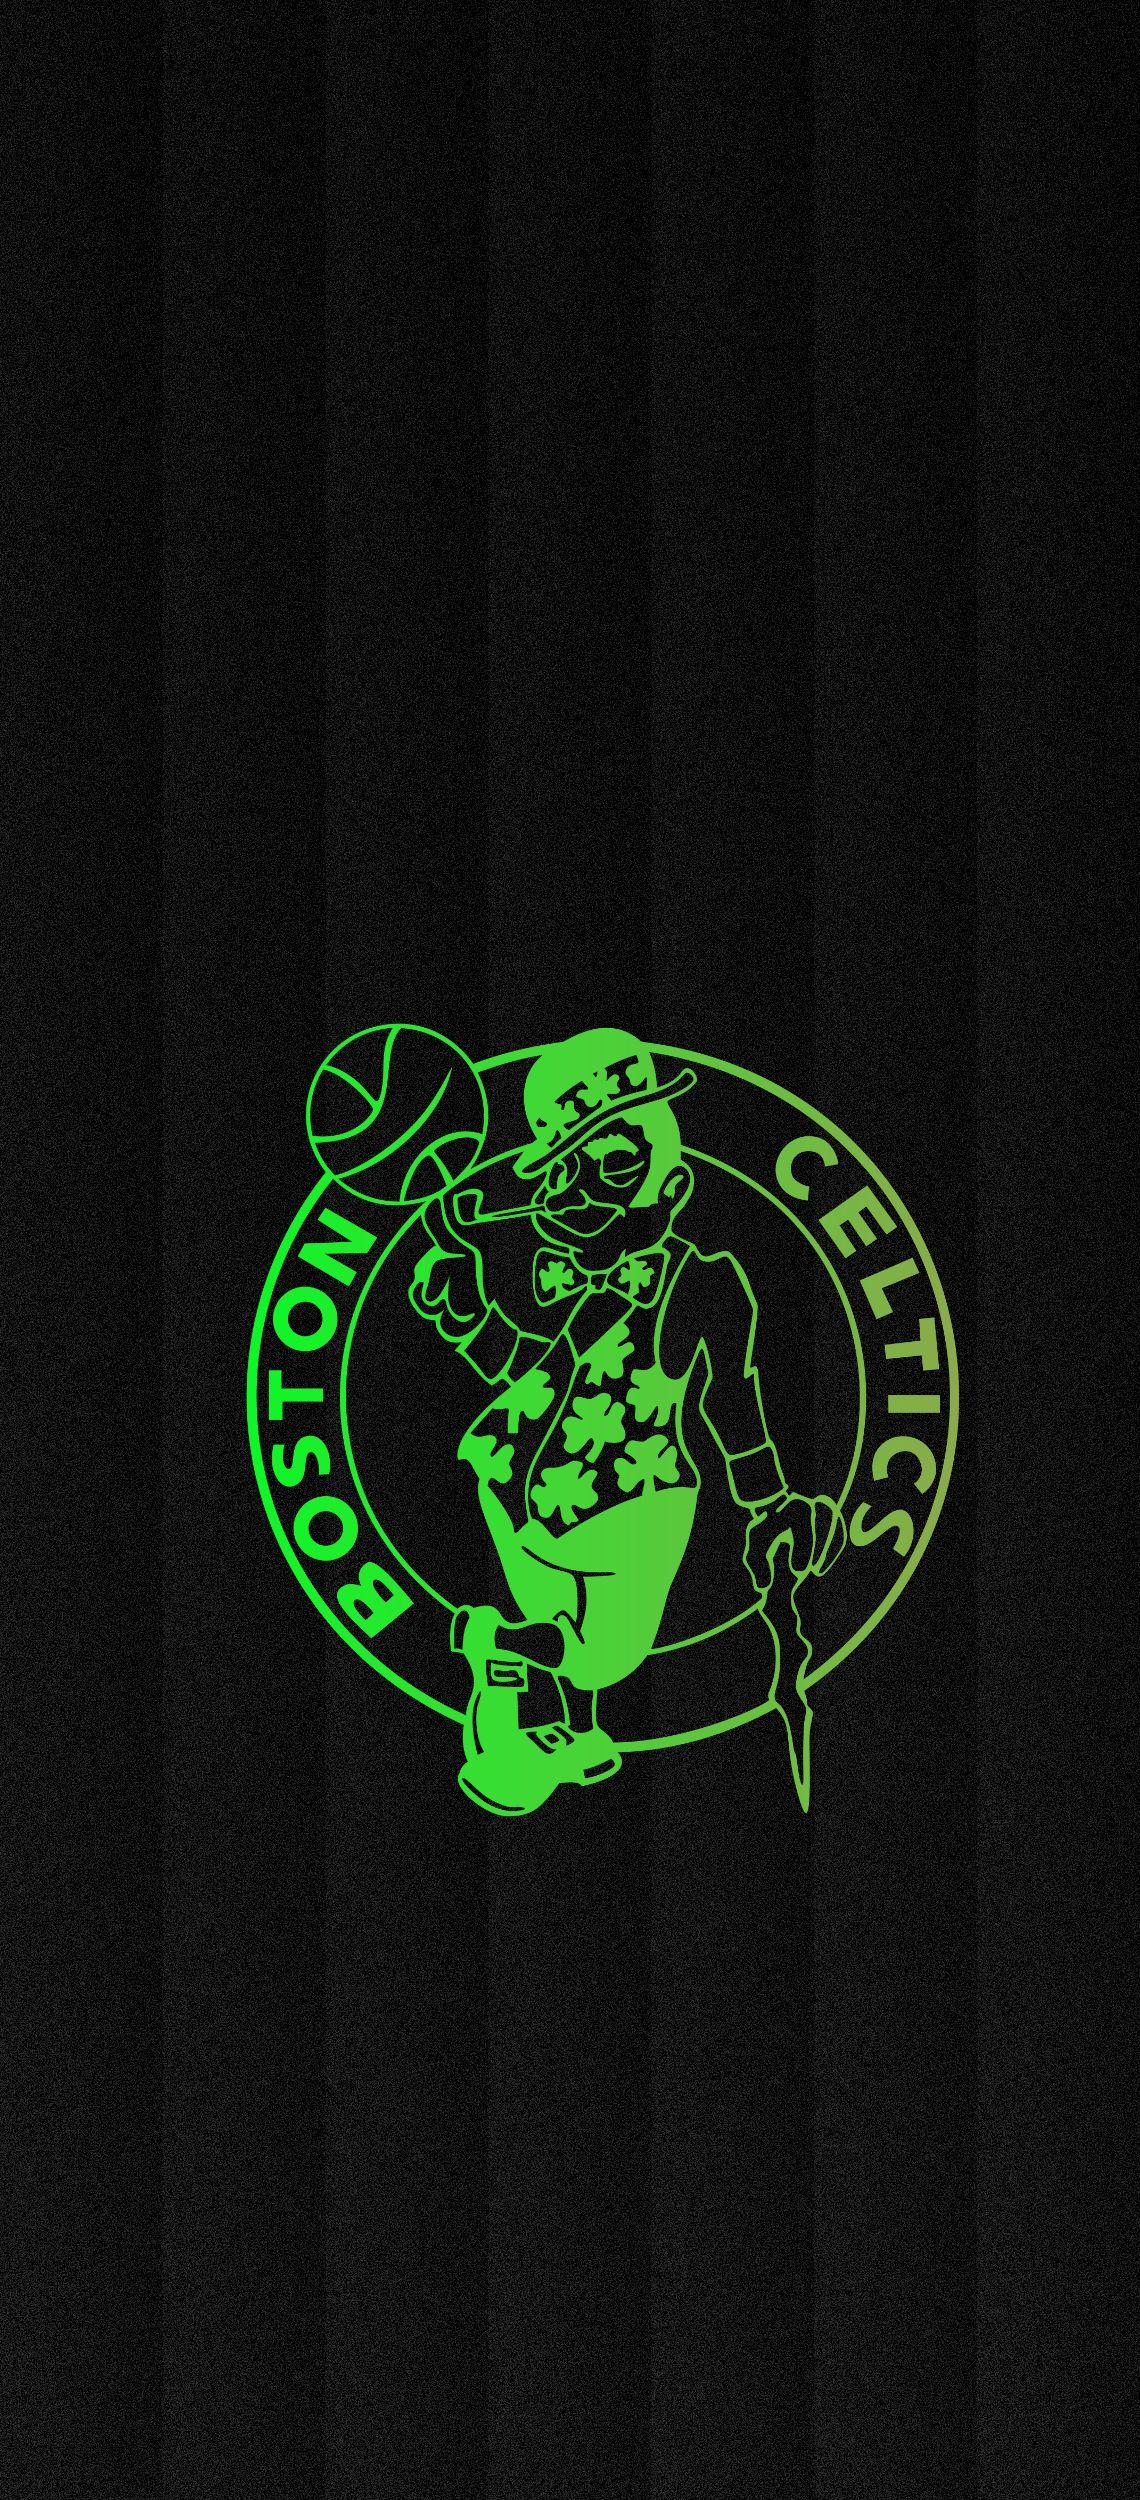 Boston Celtics Gradient Background Papel De Parede Wallpaper Planos De Fundo Basquete